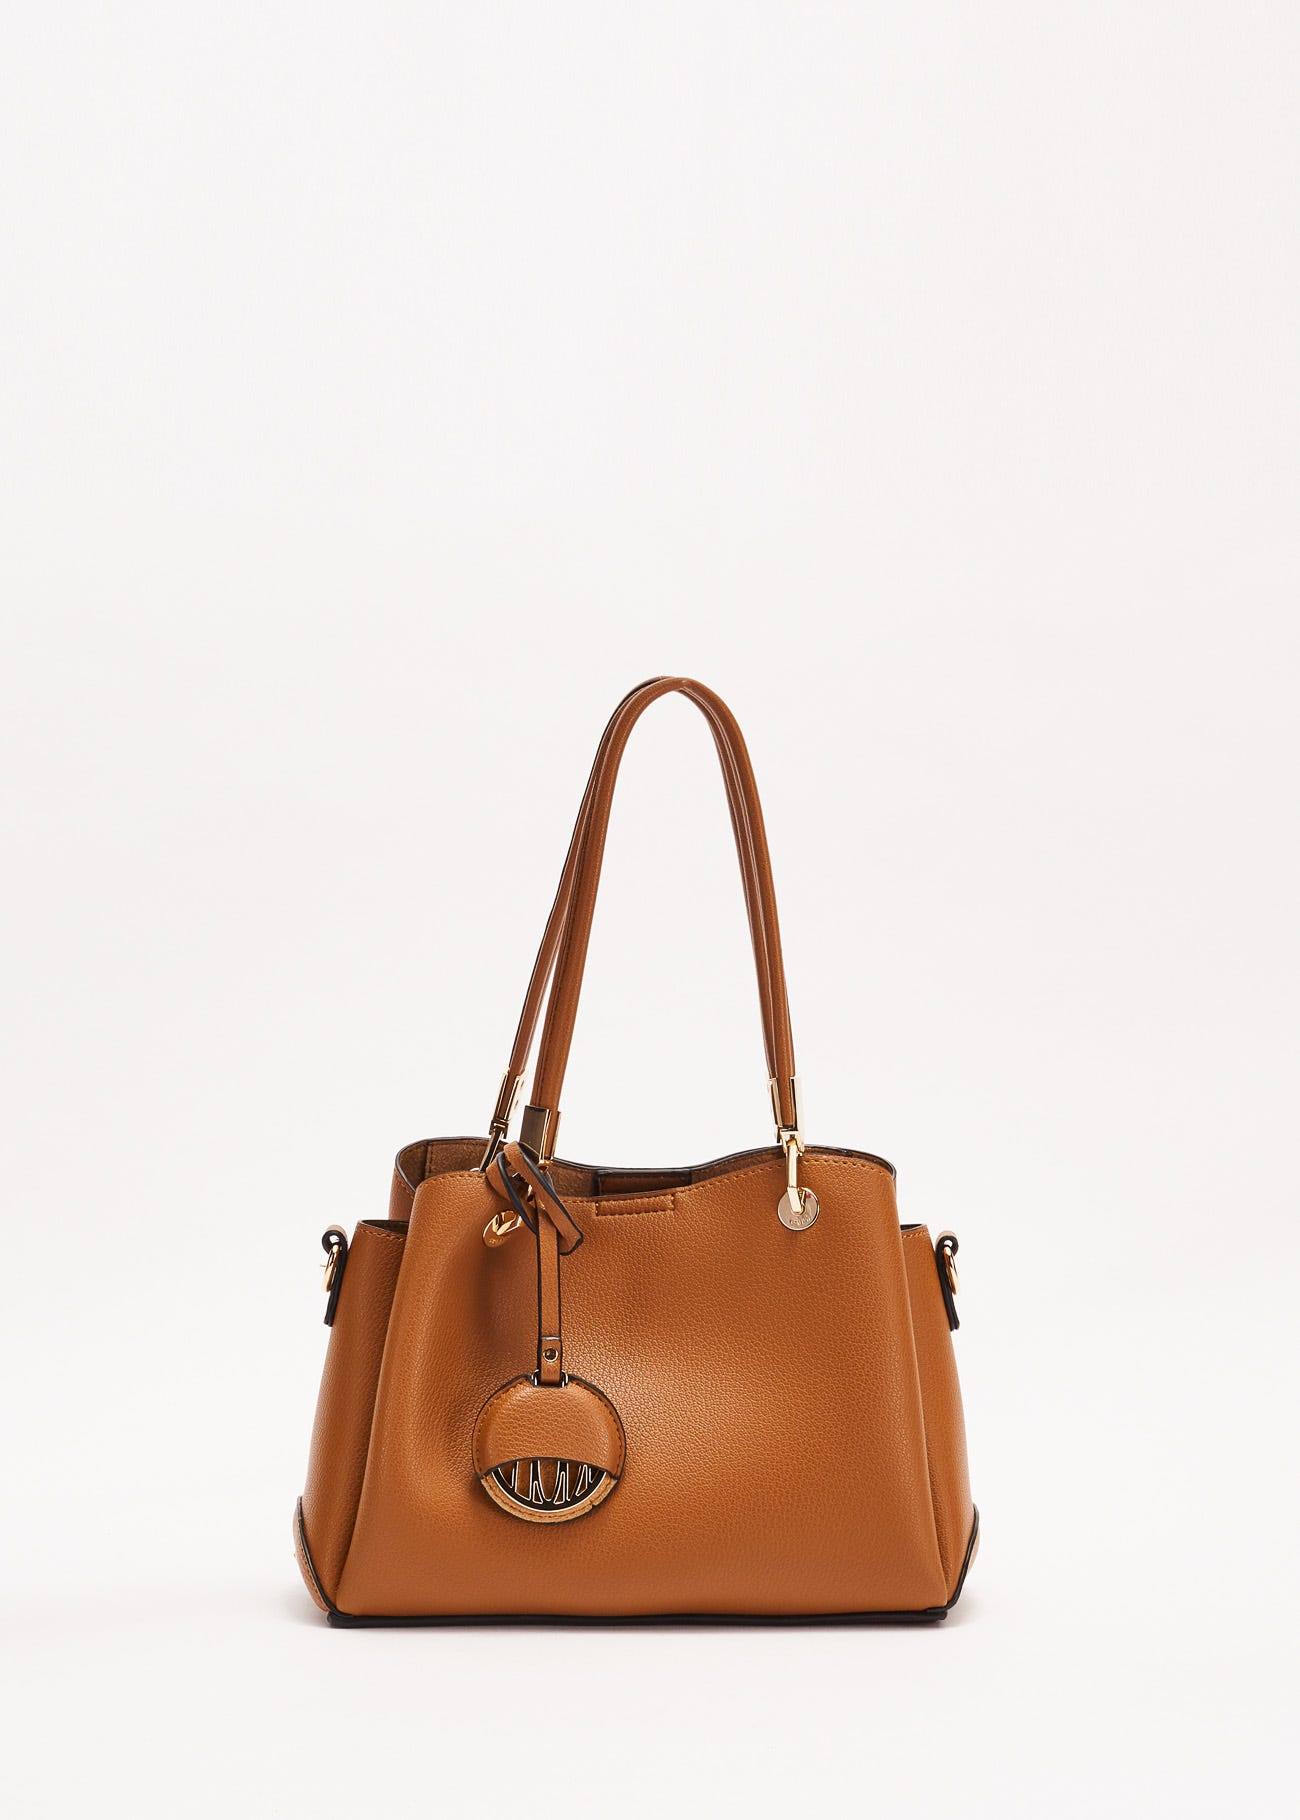 Top handle bag with charm